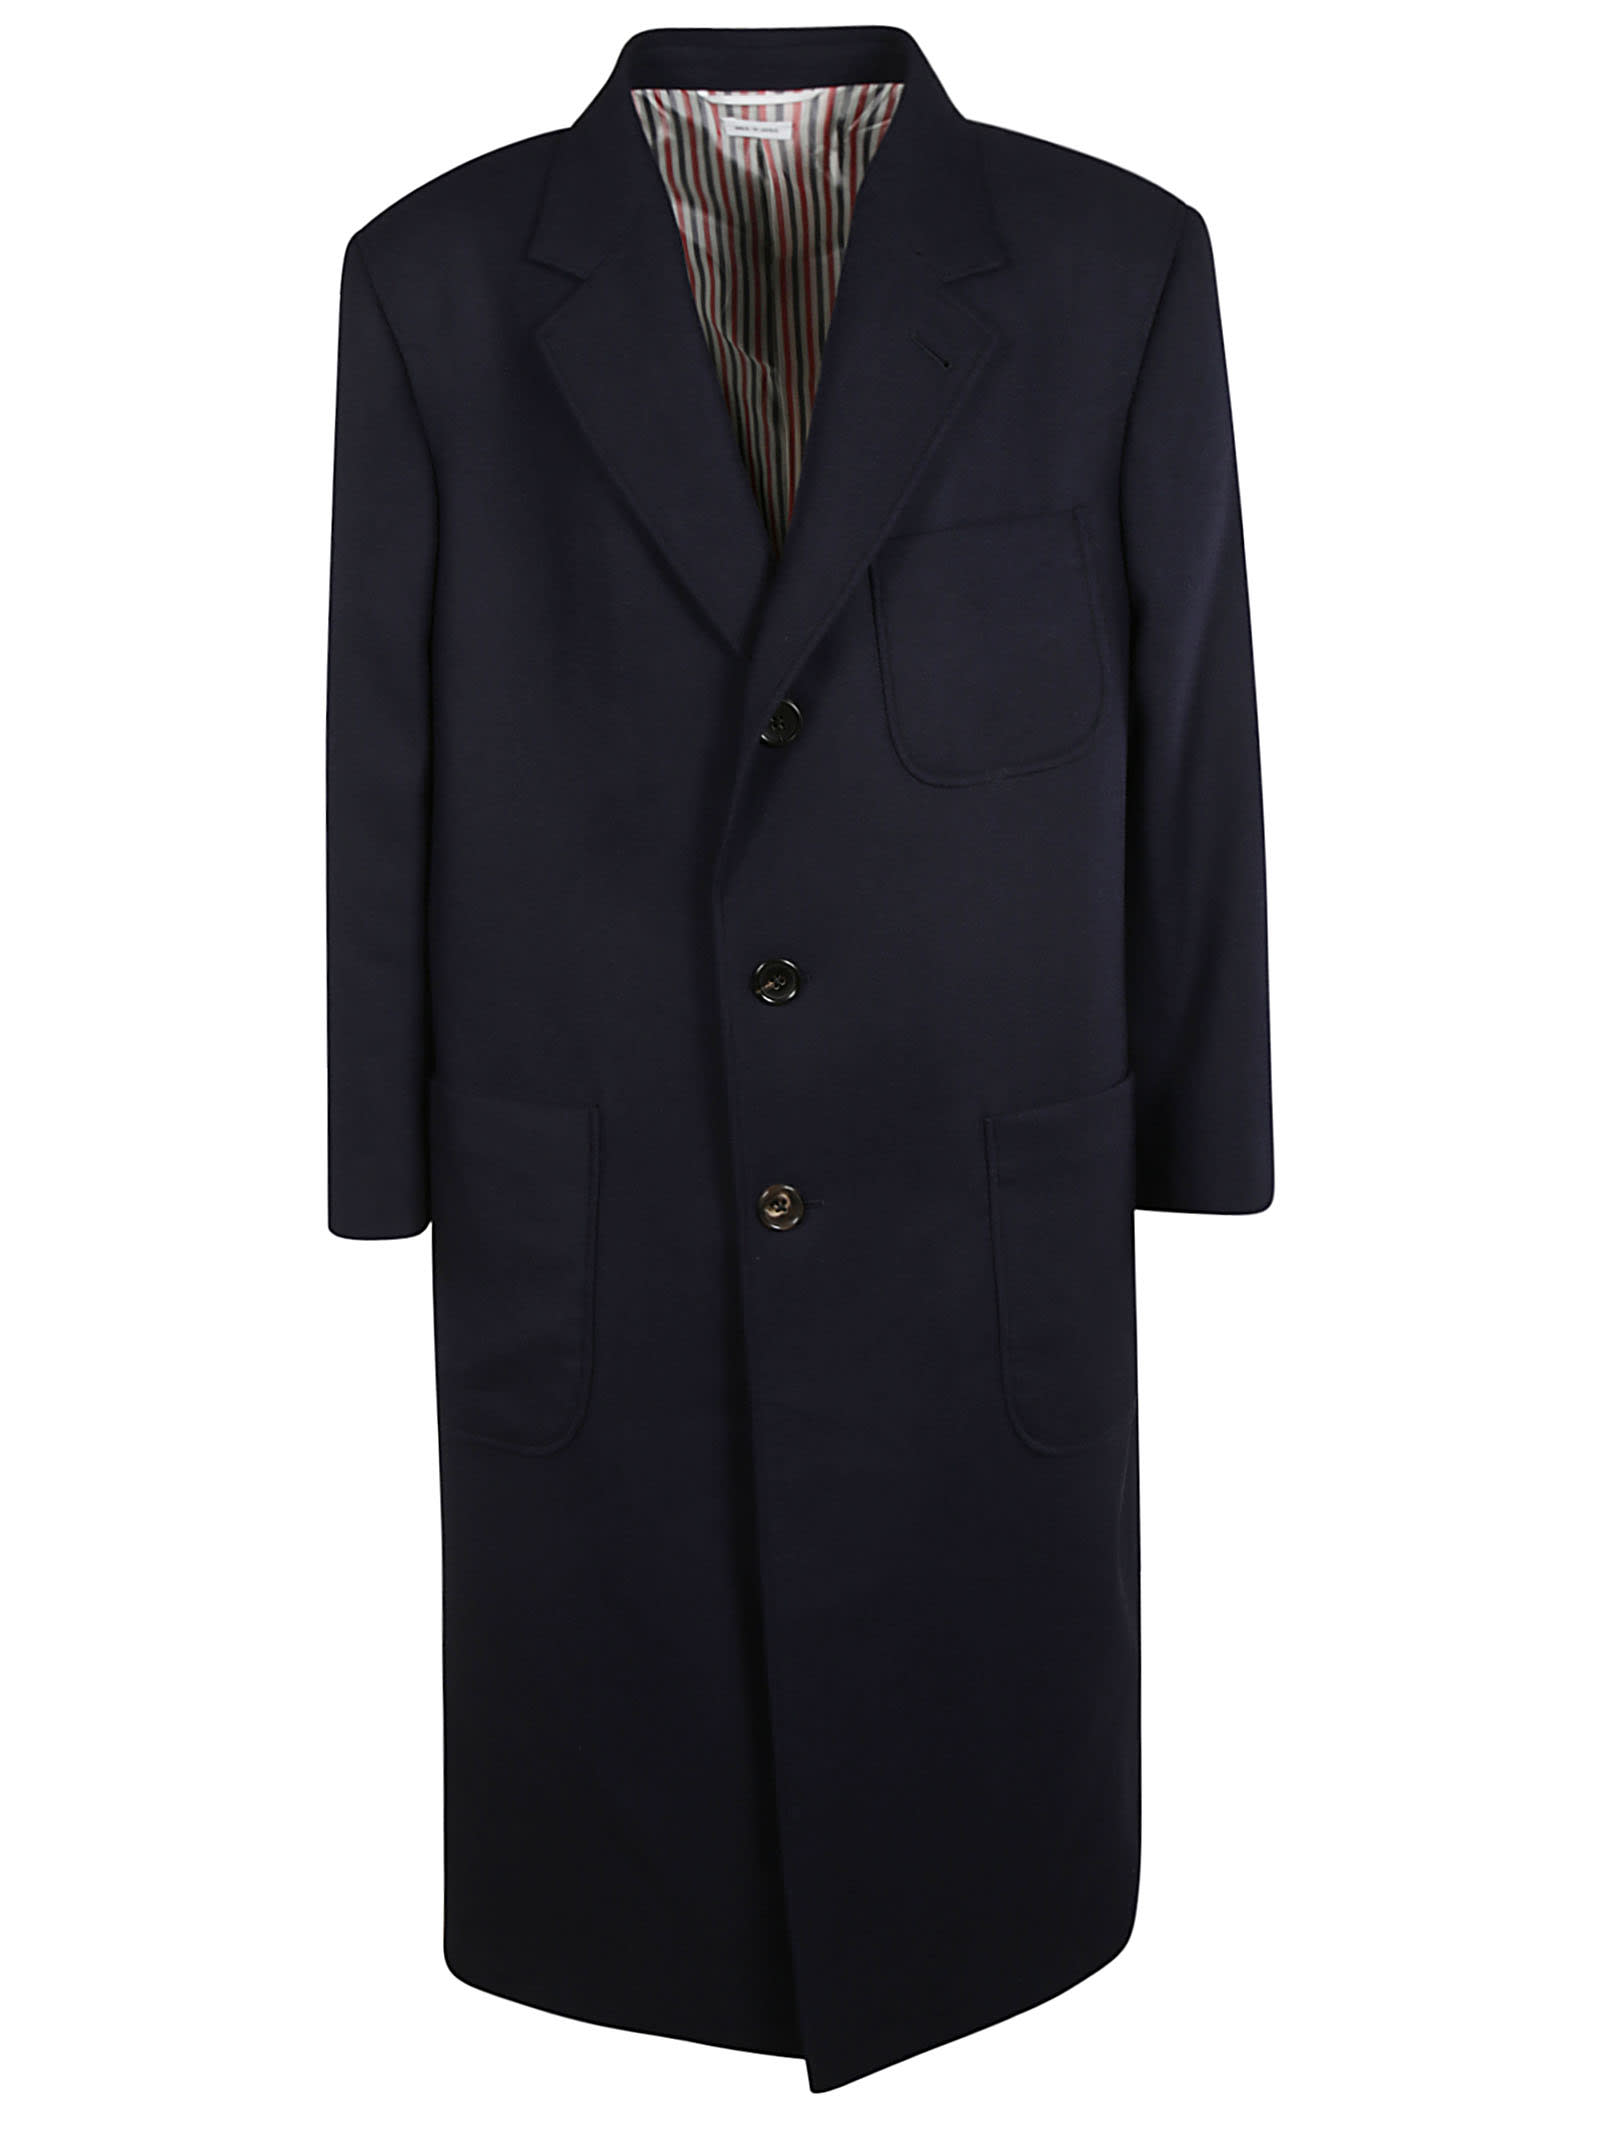 Thom Browne Oversized Patch Pocket Coat